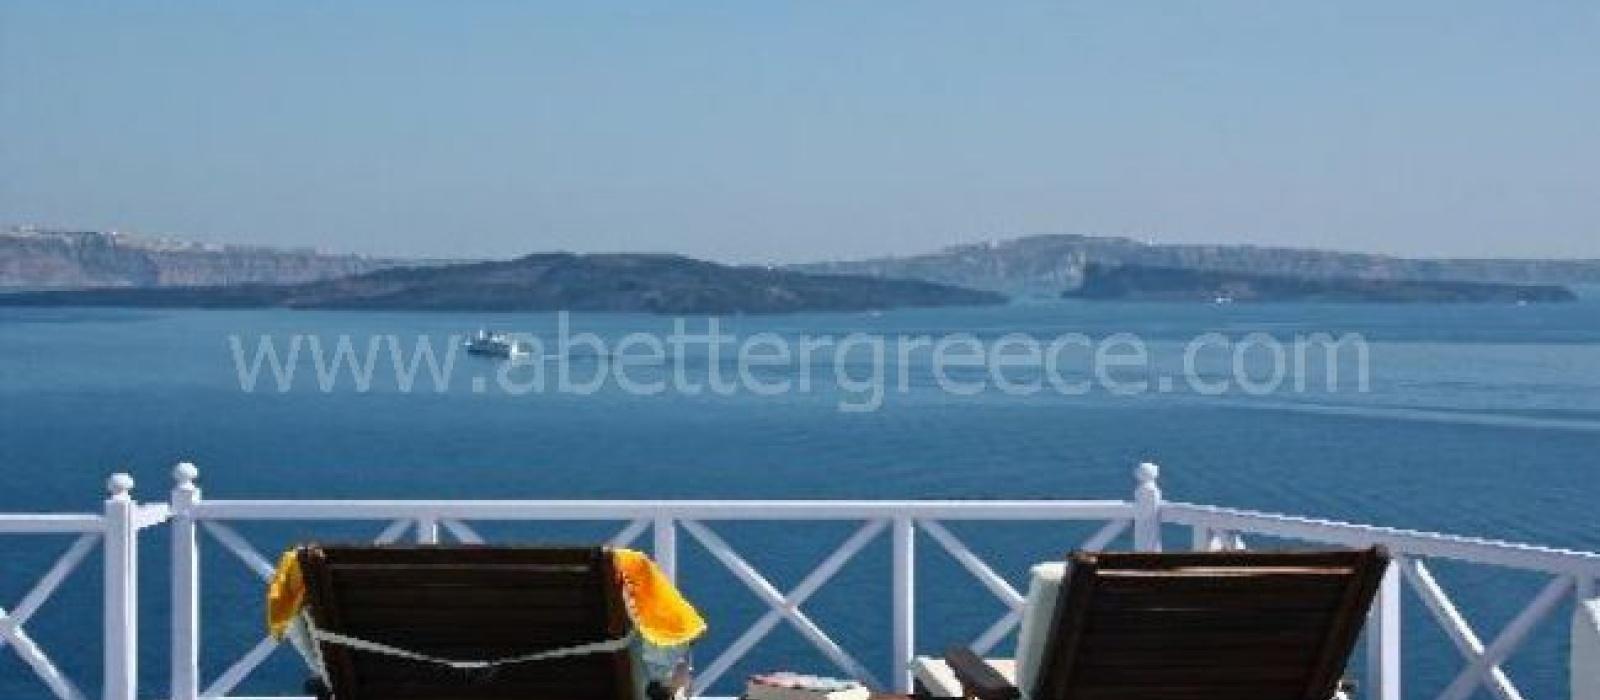 1 Bedrooms, Apartment, Vacation Rental, 1 Bathrooms, Listing ID 1185, Santorini, Greece,